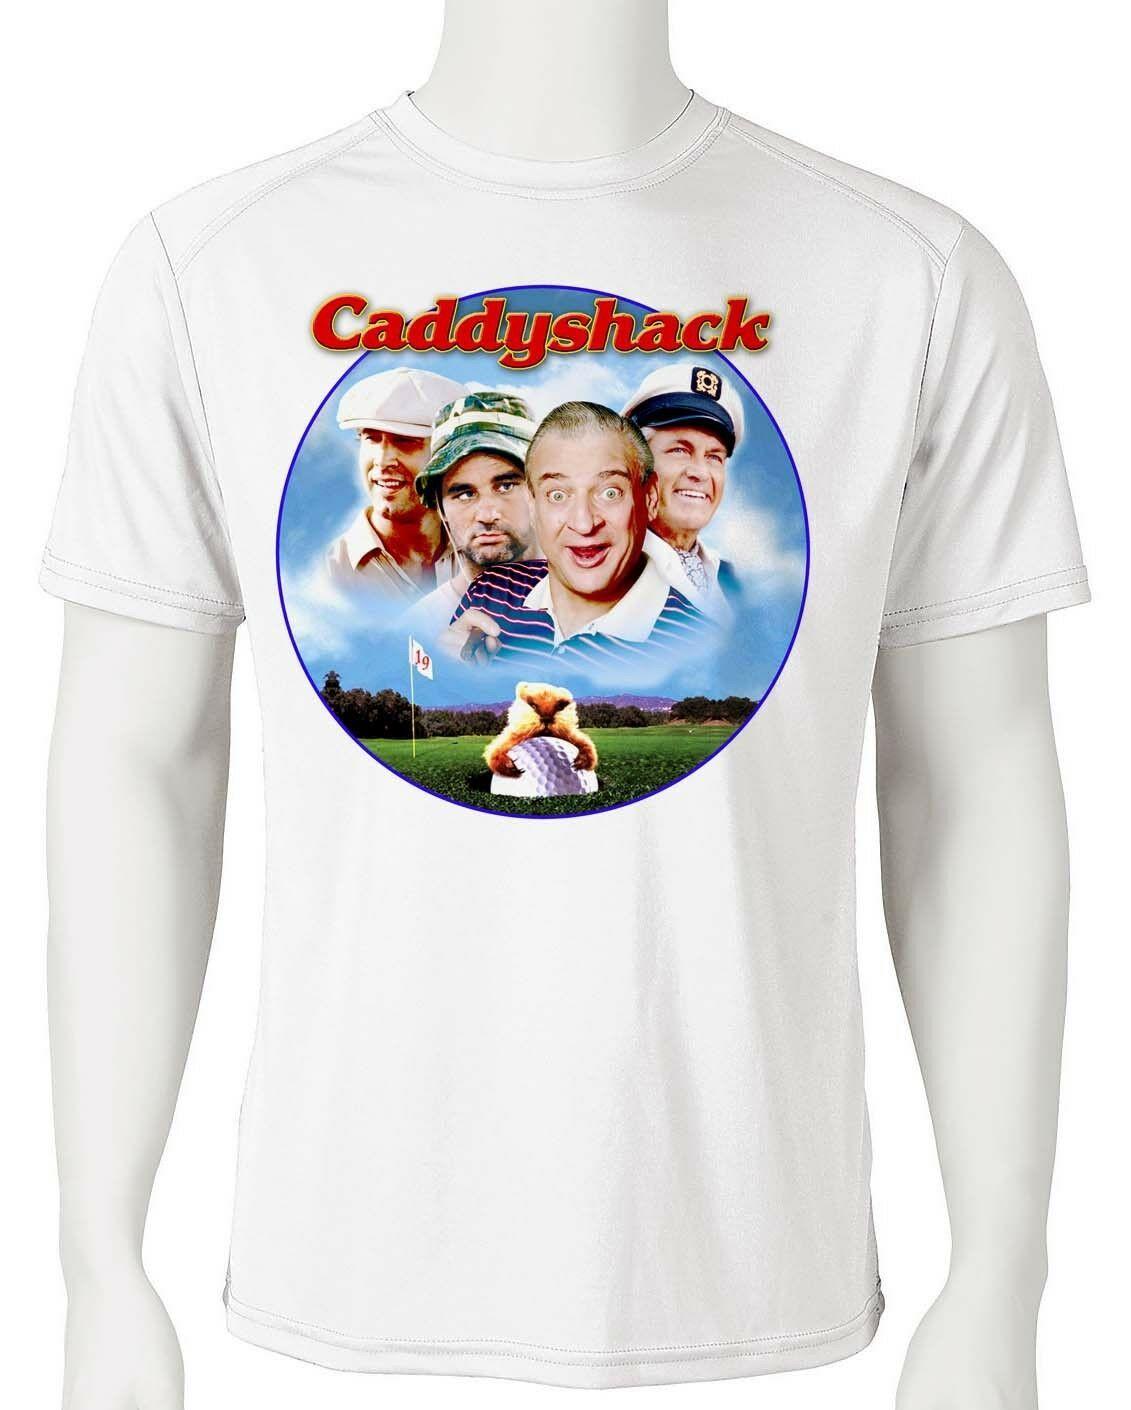 Caddyshack dri fit graphic tshirt moisture wicking golf 80s retro movie spf tee